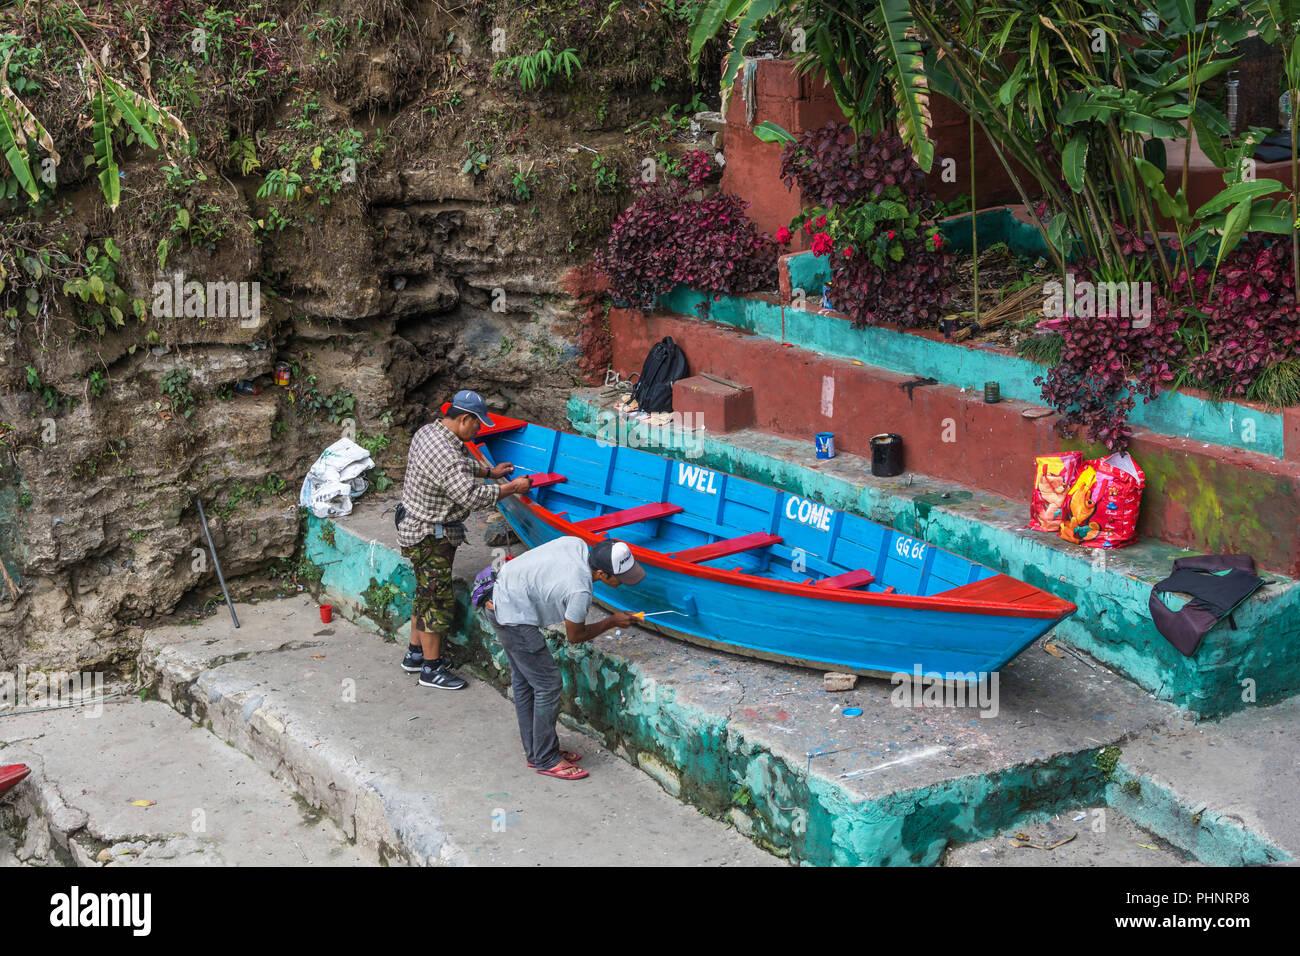 Pokhara, Nepal -11.04.2018: Zwei Arbeiter malen ein holzboot am 11. April 2018 in Pokhara, Nepal. Stockbild